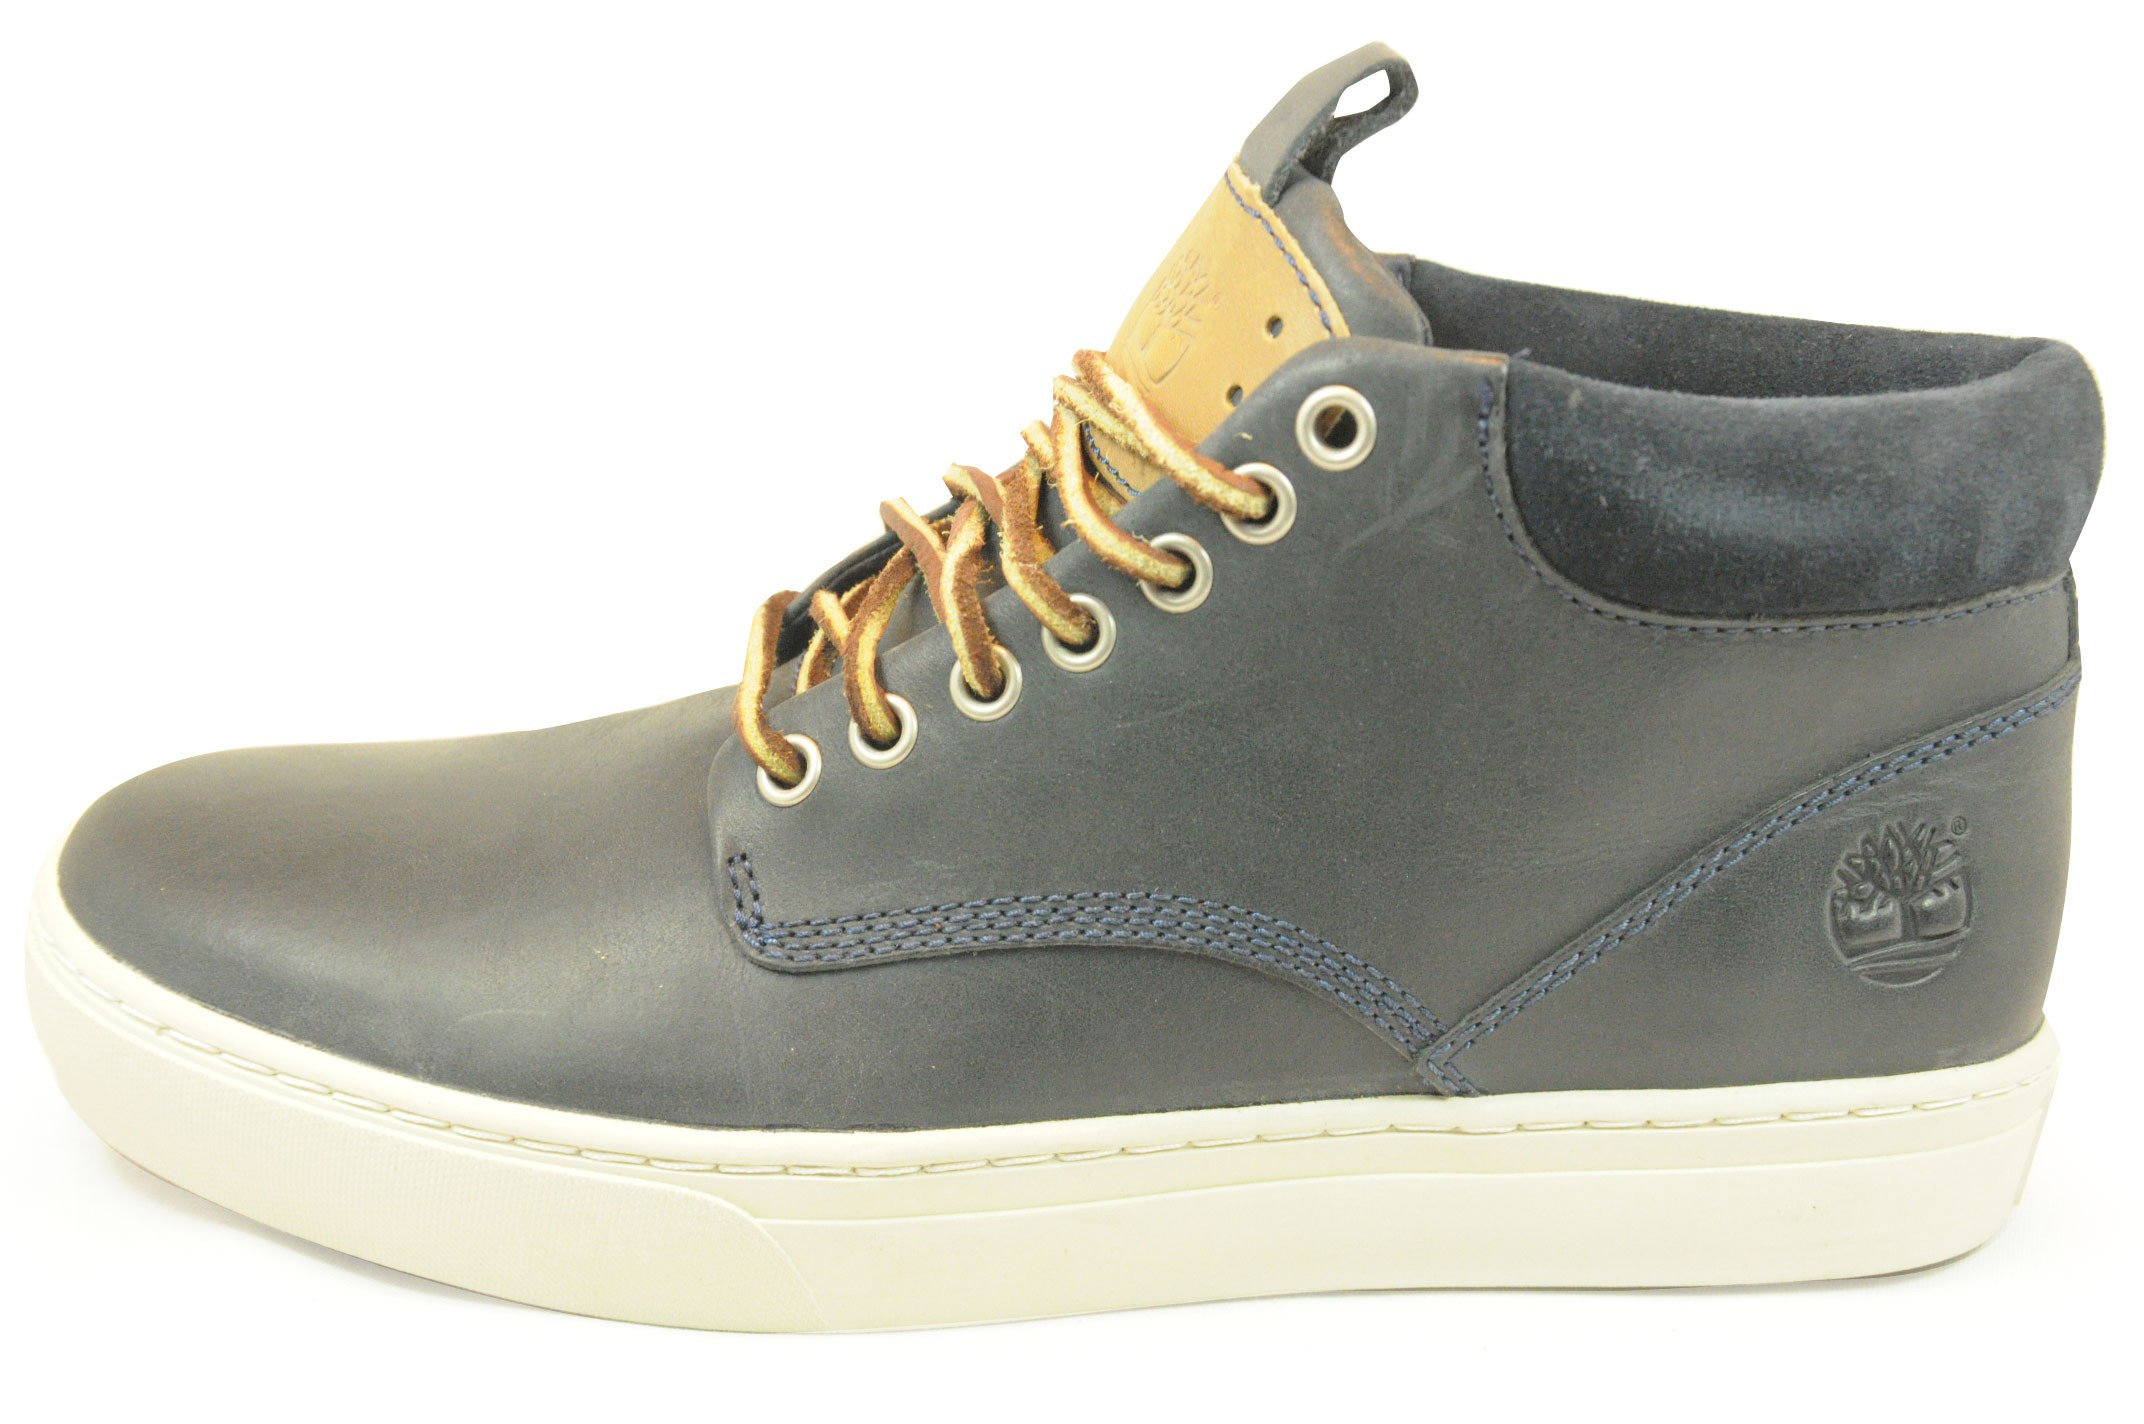 Foto des unpaars Timberland Sneakers